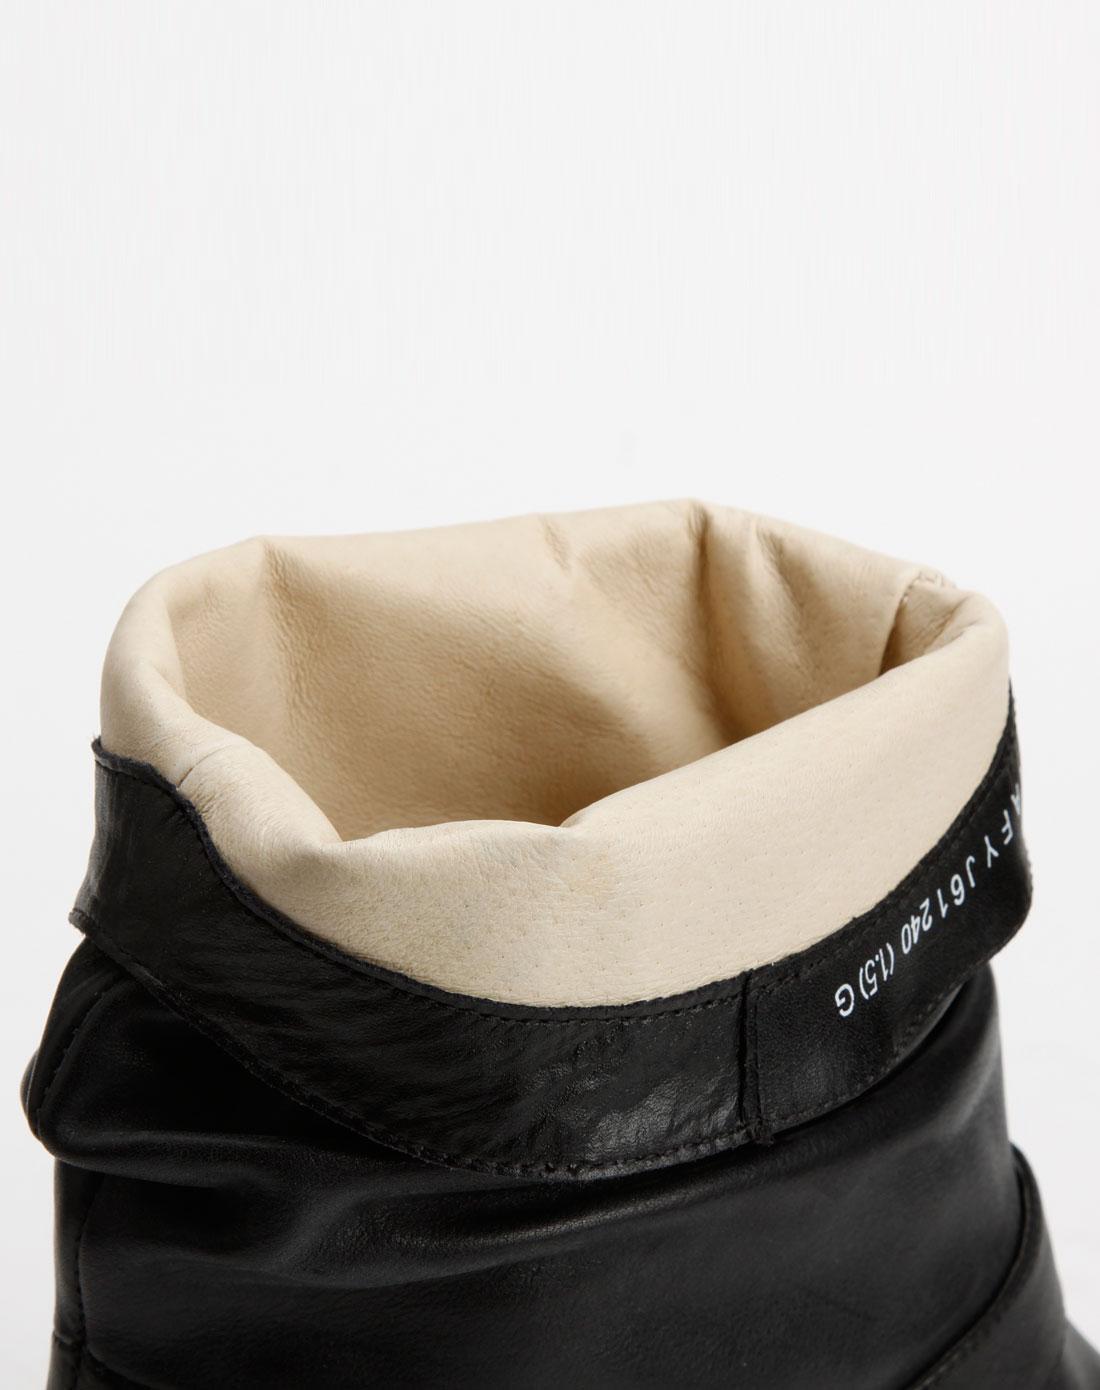 tata 黑色平跟软牛皮靴